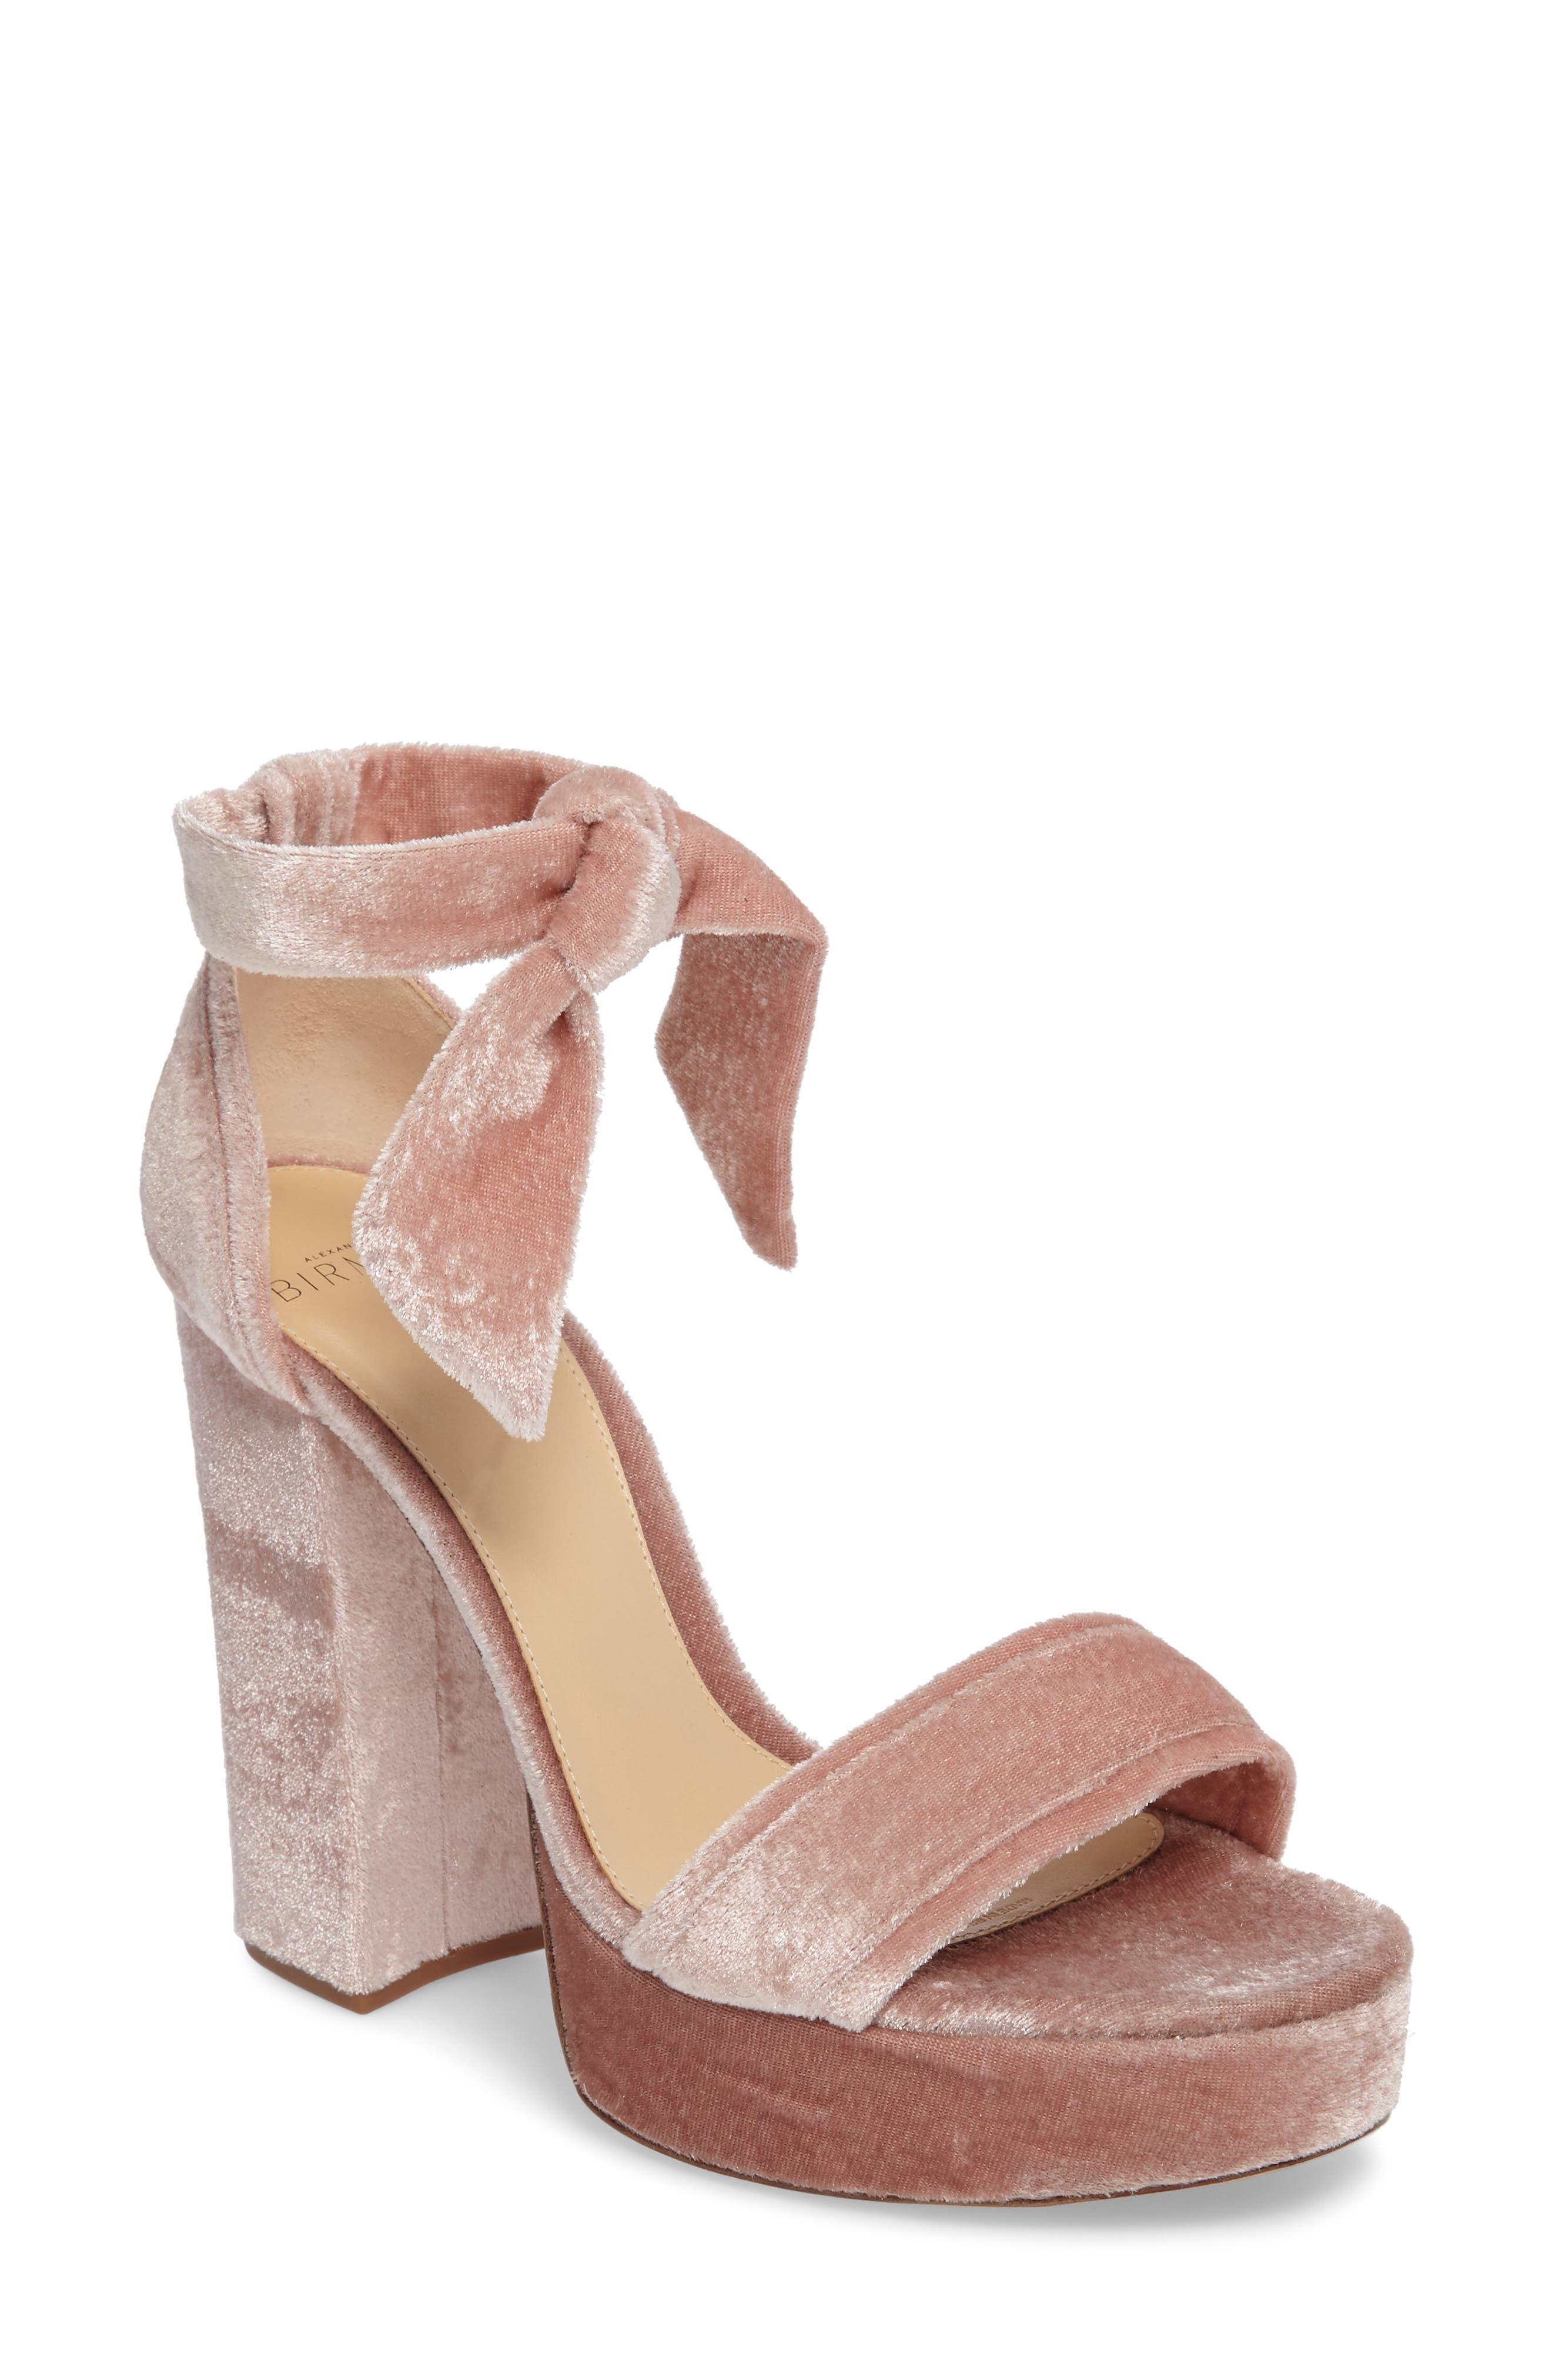 Celine Platform Sandal,                             Main thumbnail 1, color,                             Blush